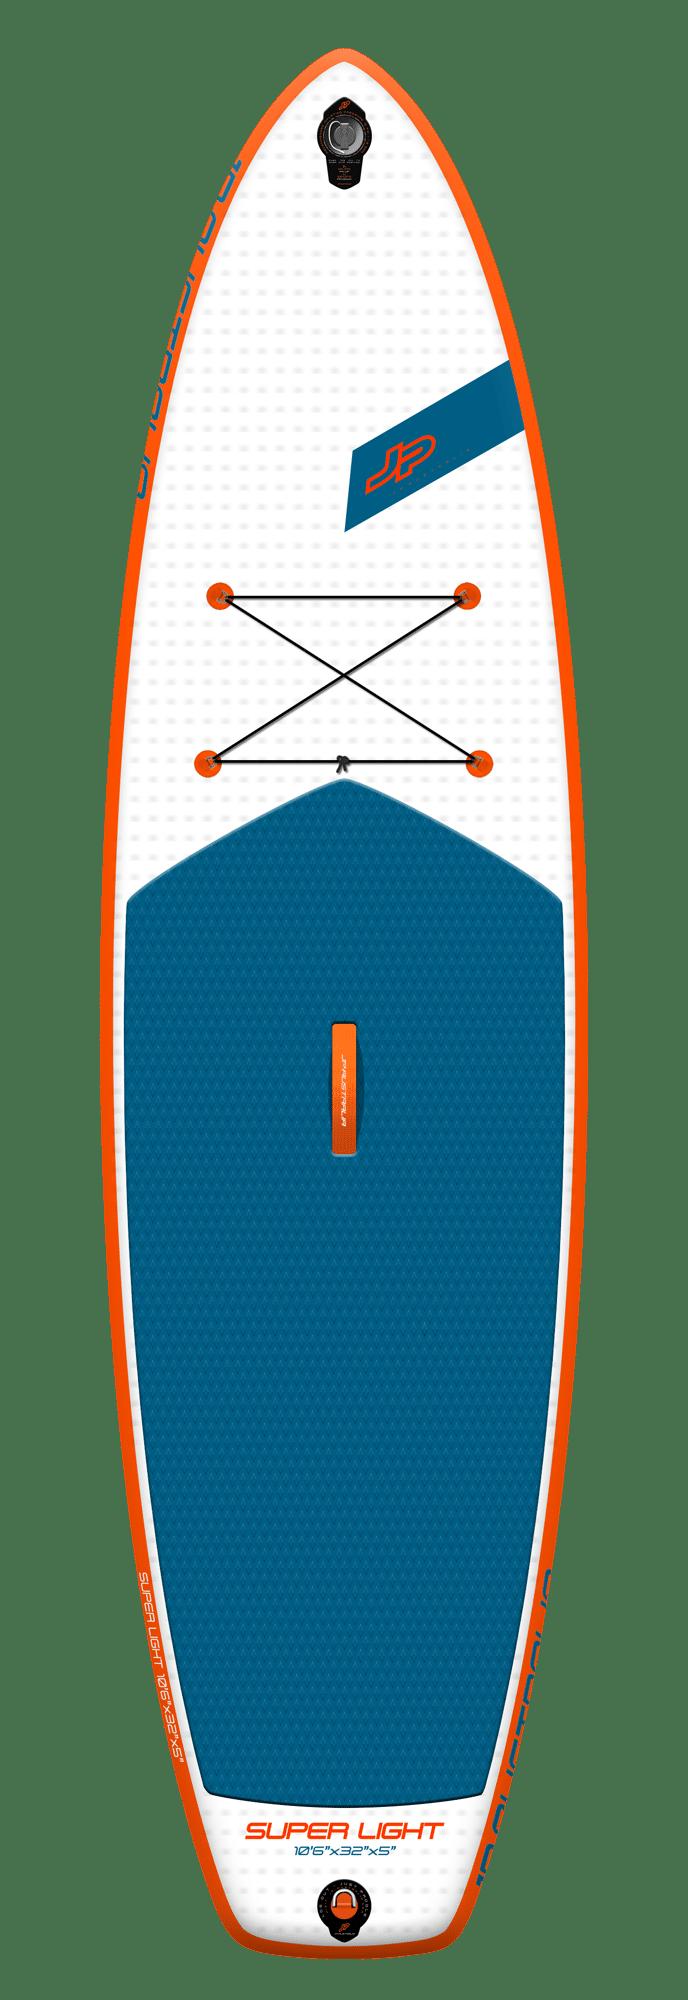 JP-SUP-Inflatable-2020-Superlight-deck-1